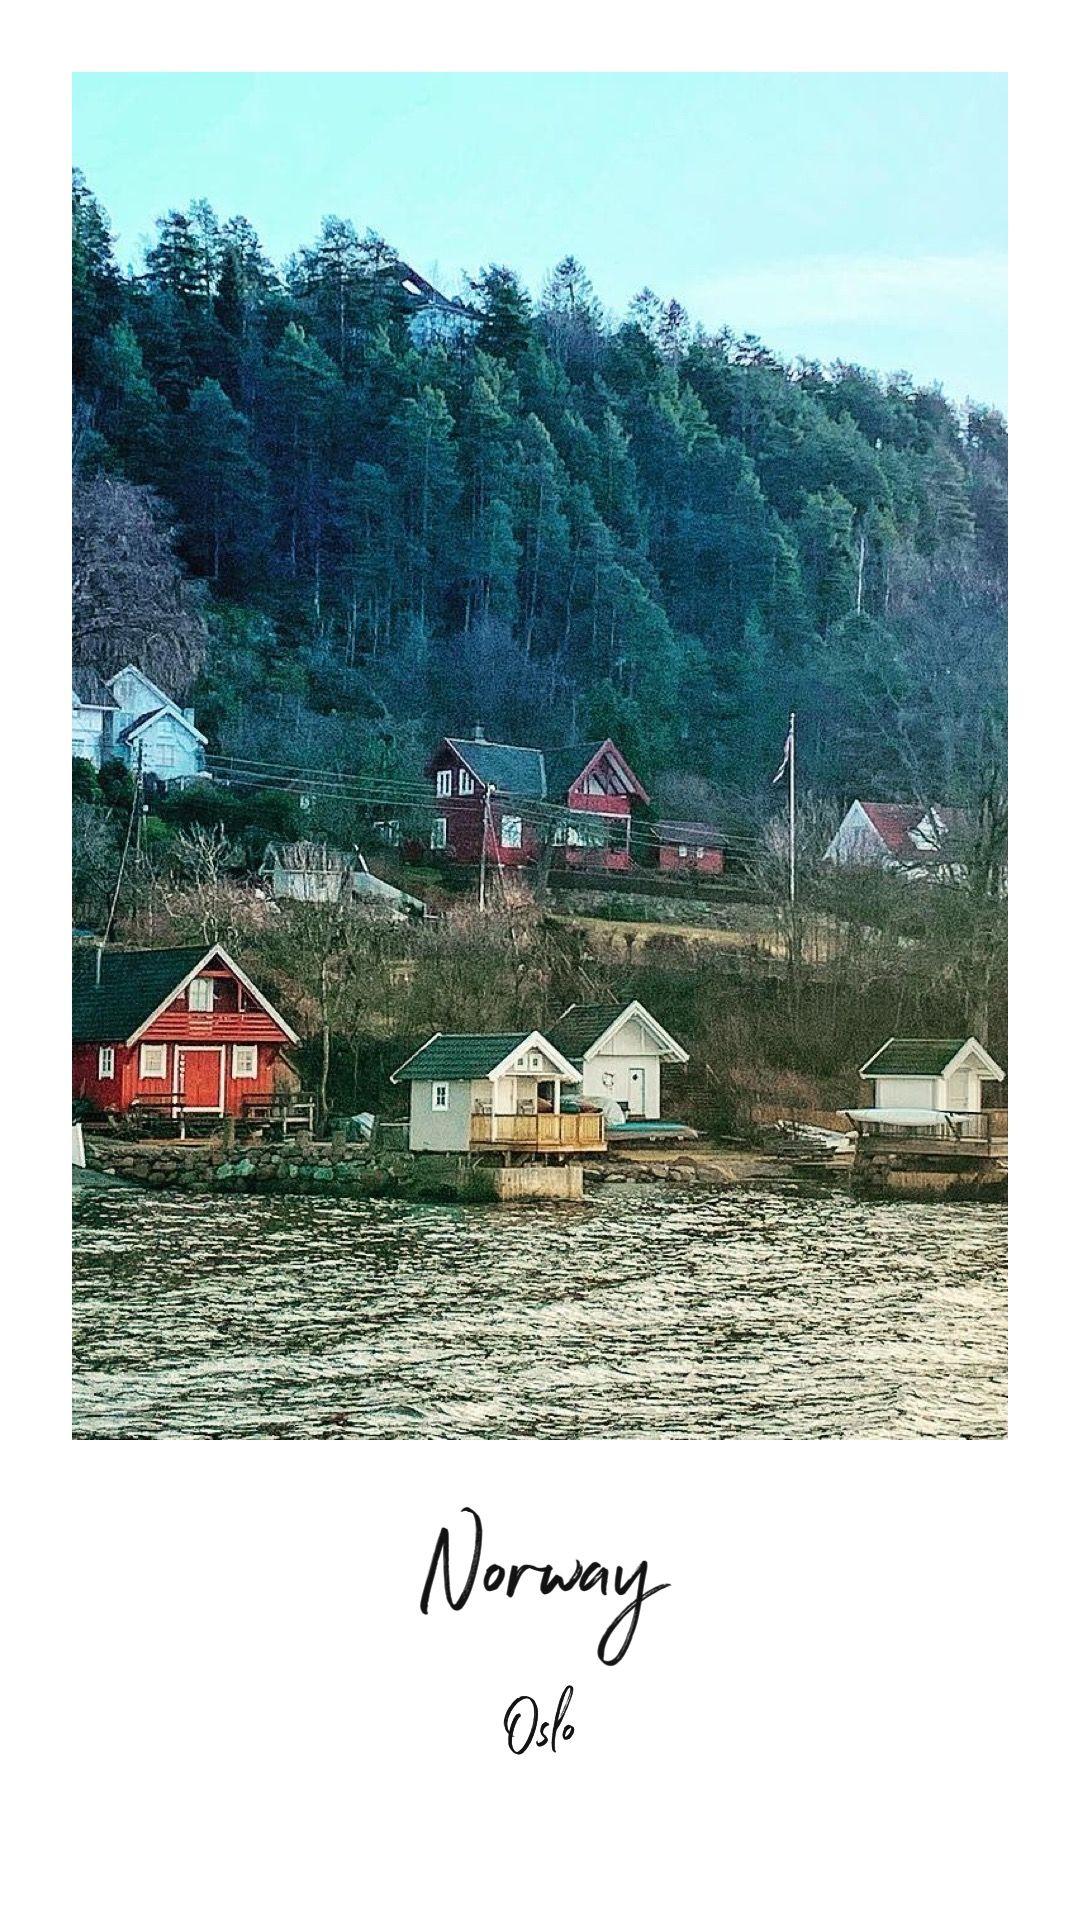 Oslo Travel Guide In